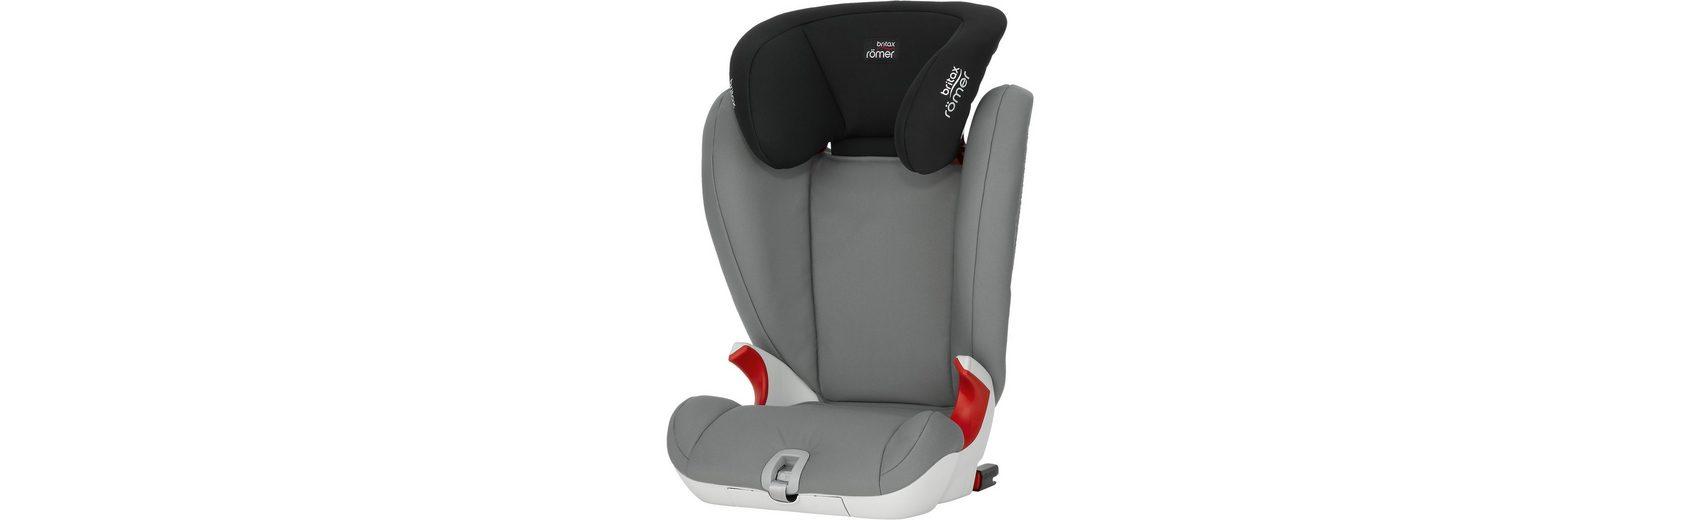 Britax Römer Auto-Kindersitz Kidfix SL, Steel Grey, 2016